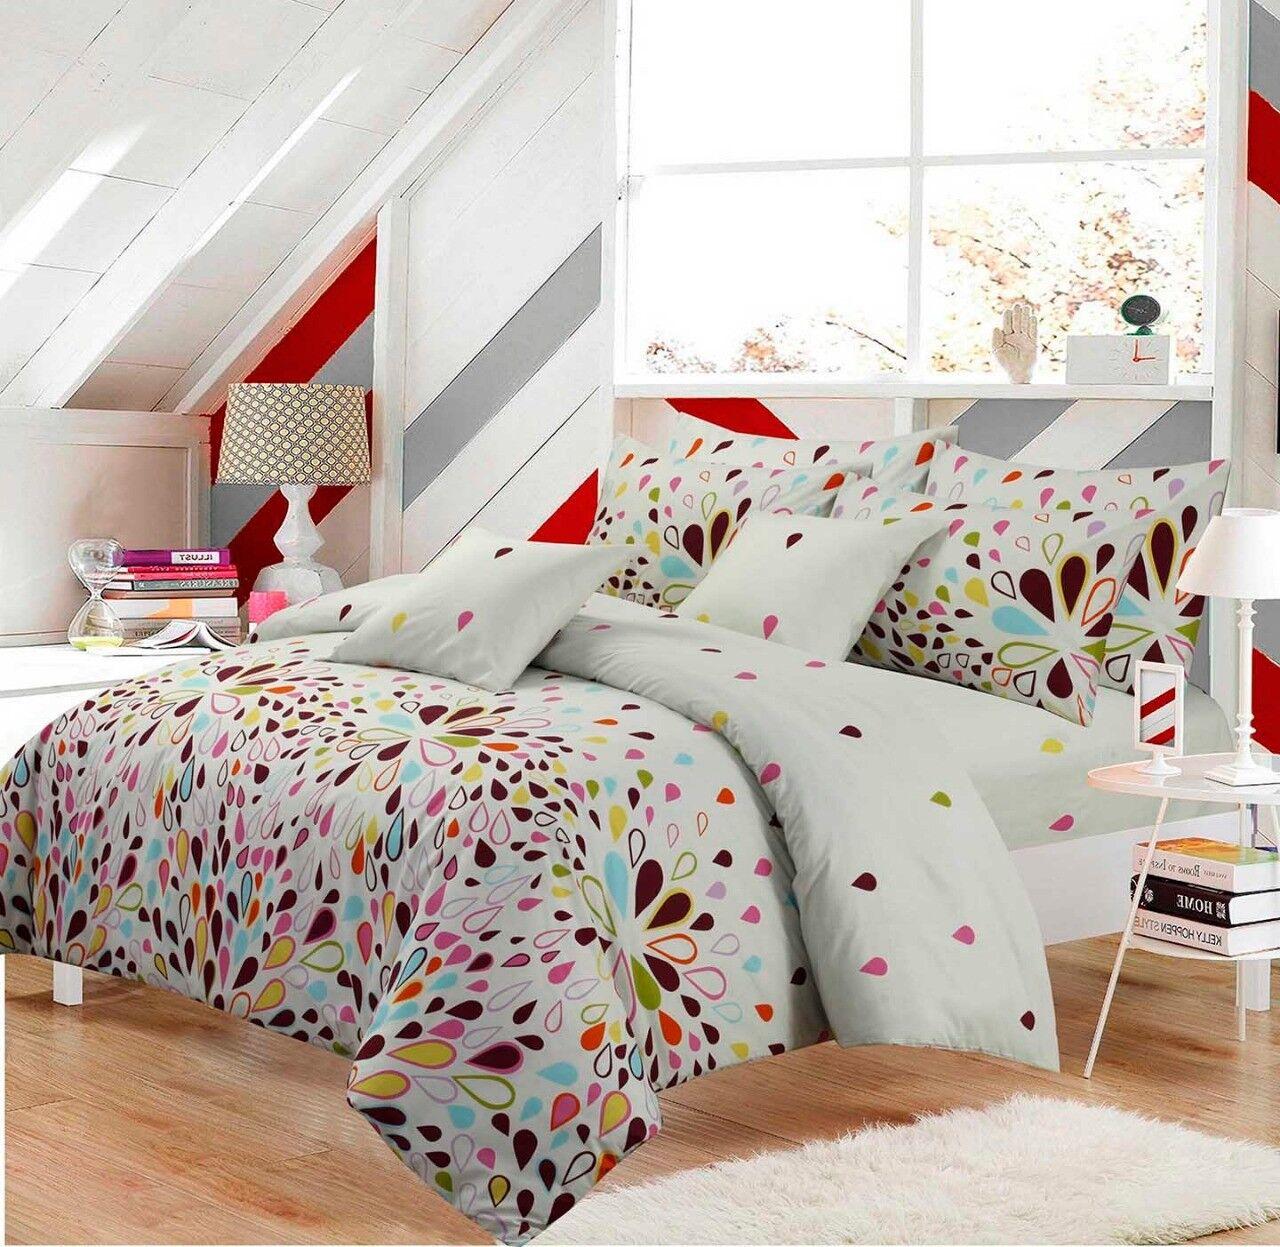 Duvet Quilt Cover Reversible Camila Design Polycotton Bedding Single Double King